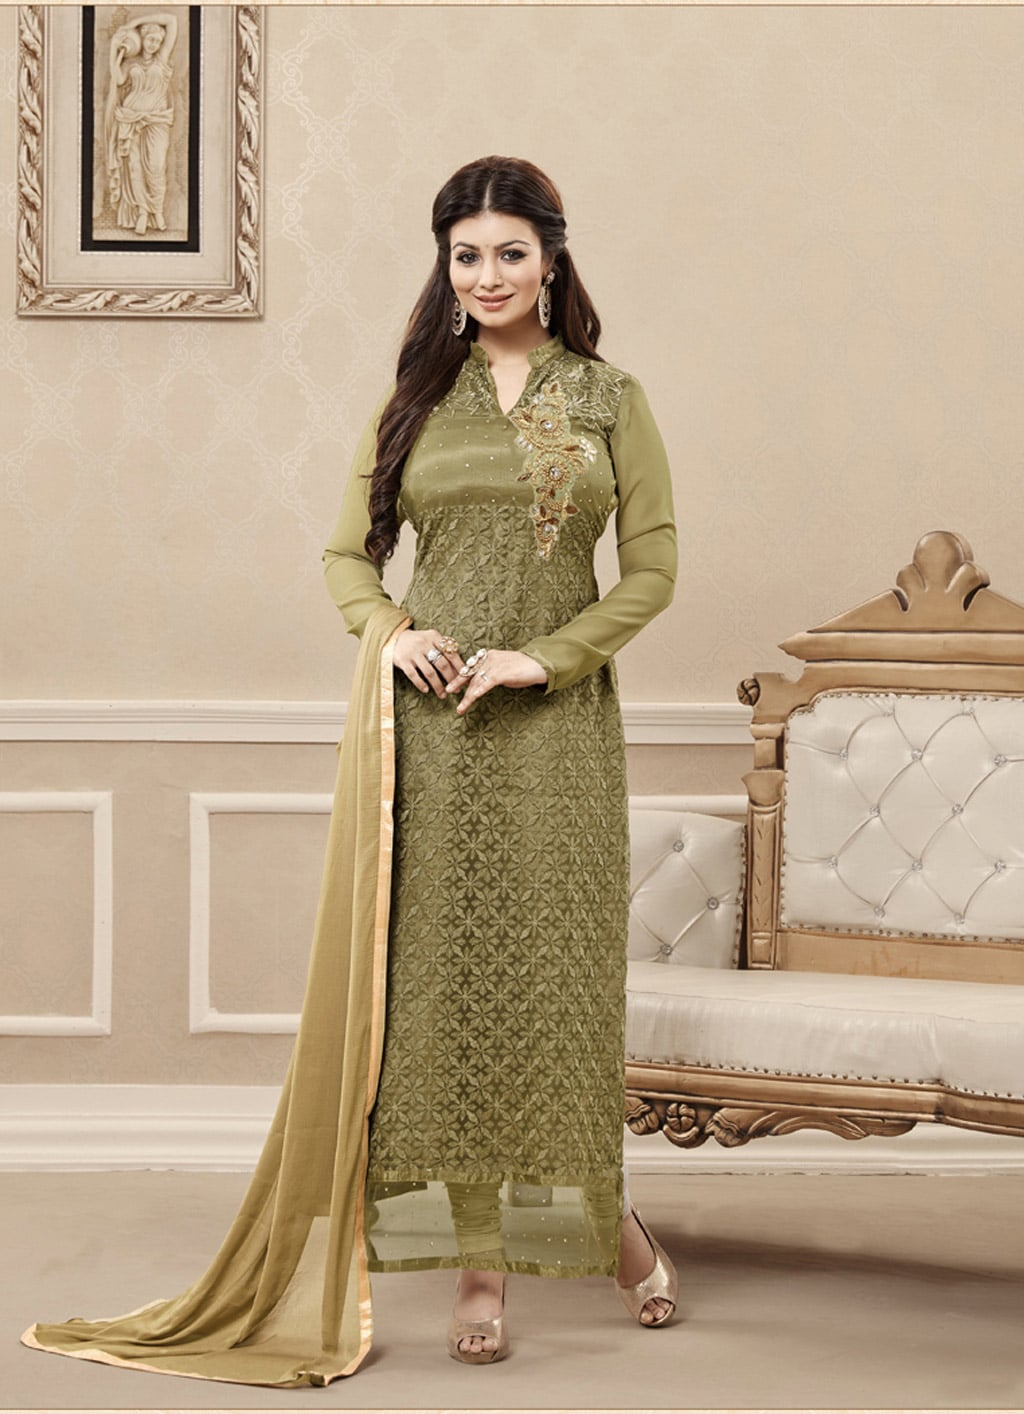 1e9c9f3471 25 Latest Trends in Pakistani Party Dresses 2018 - Dresses - Crayon